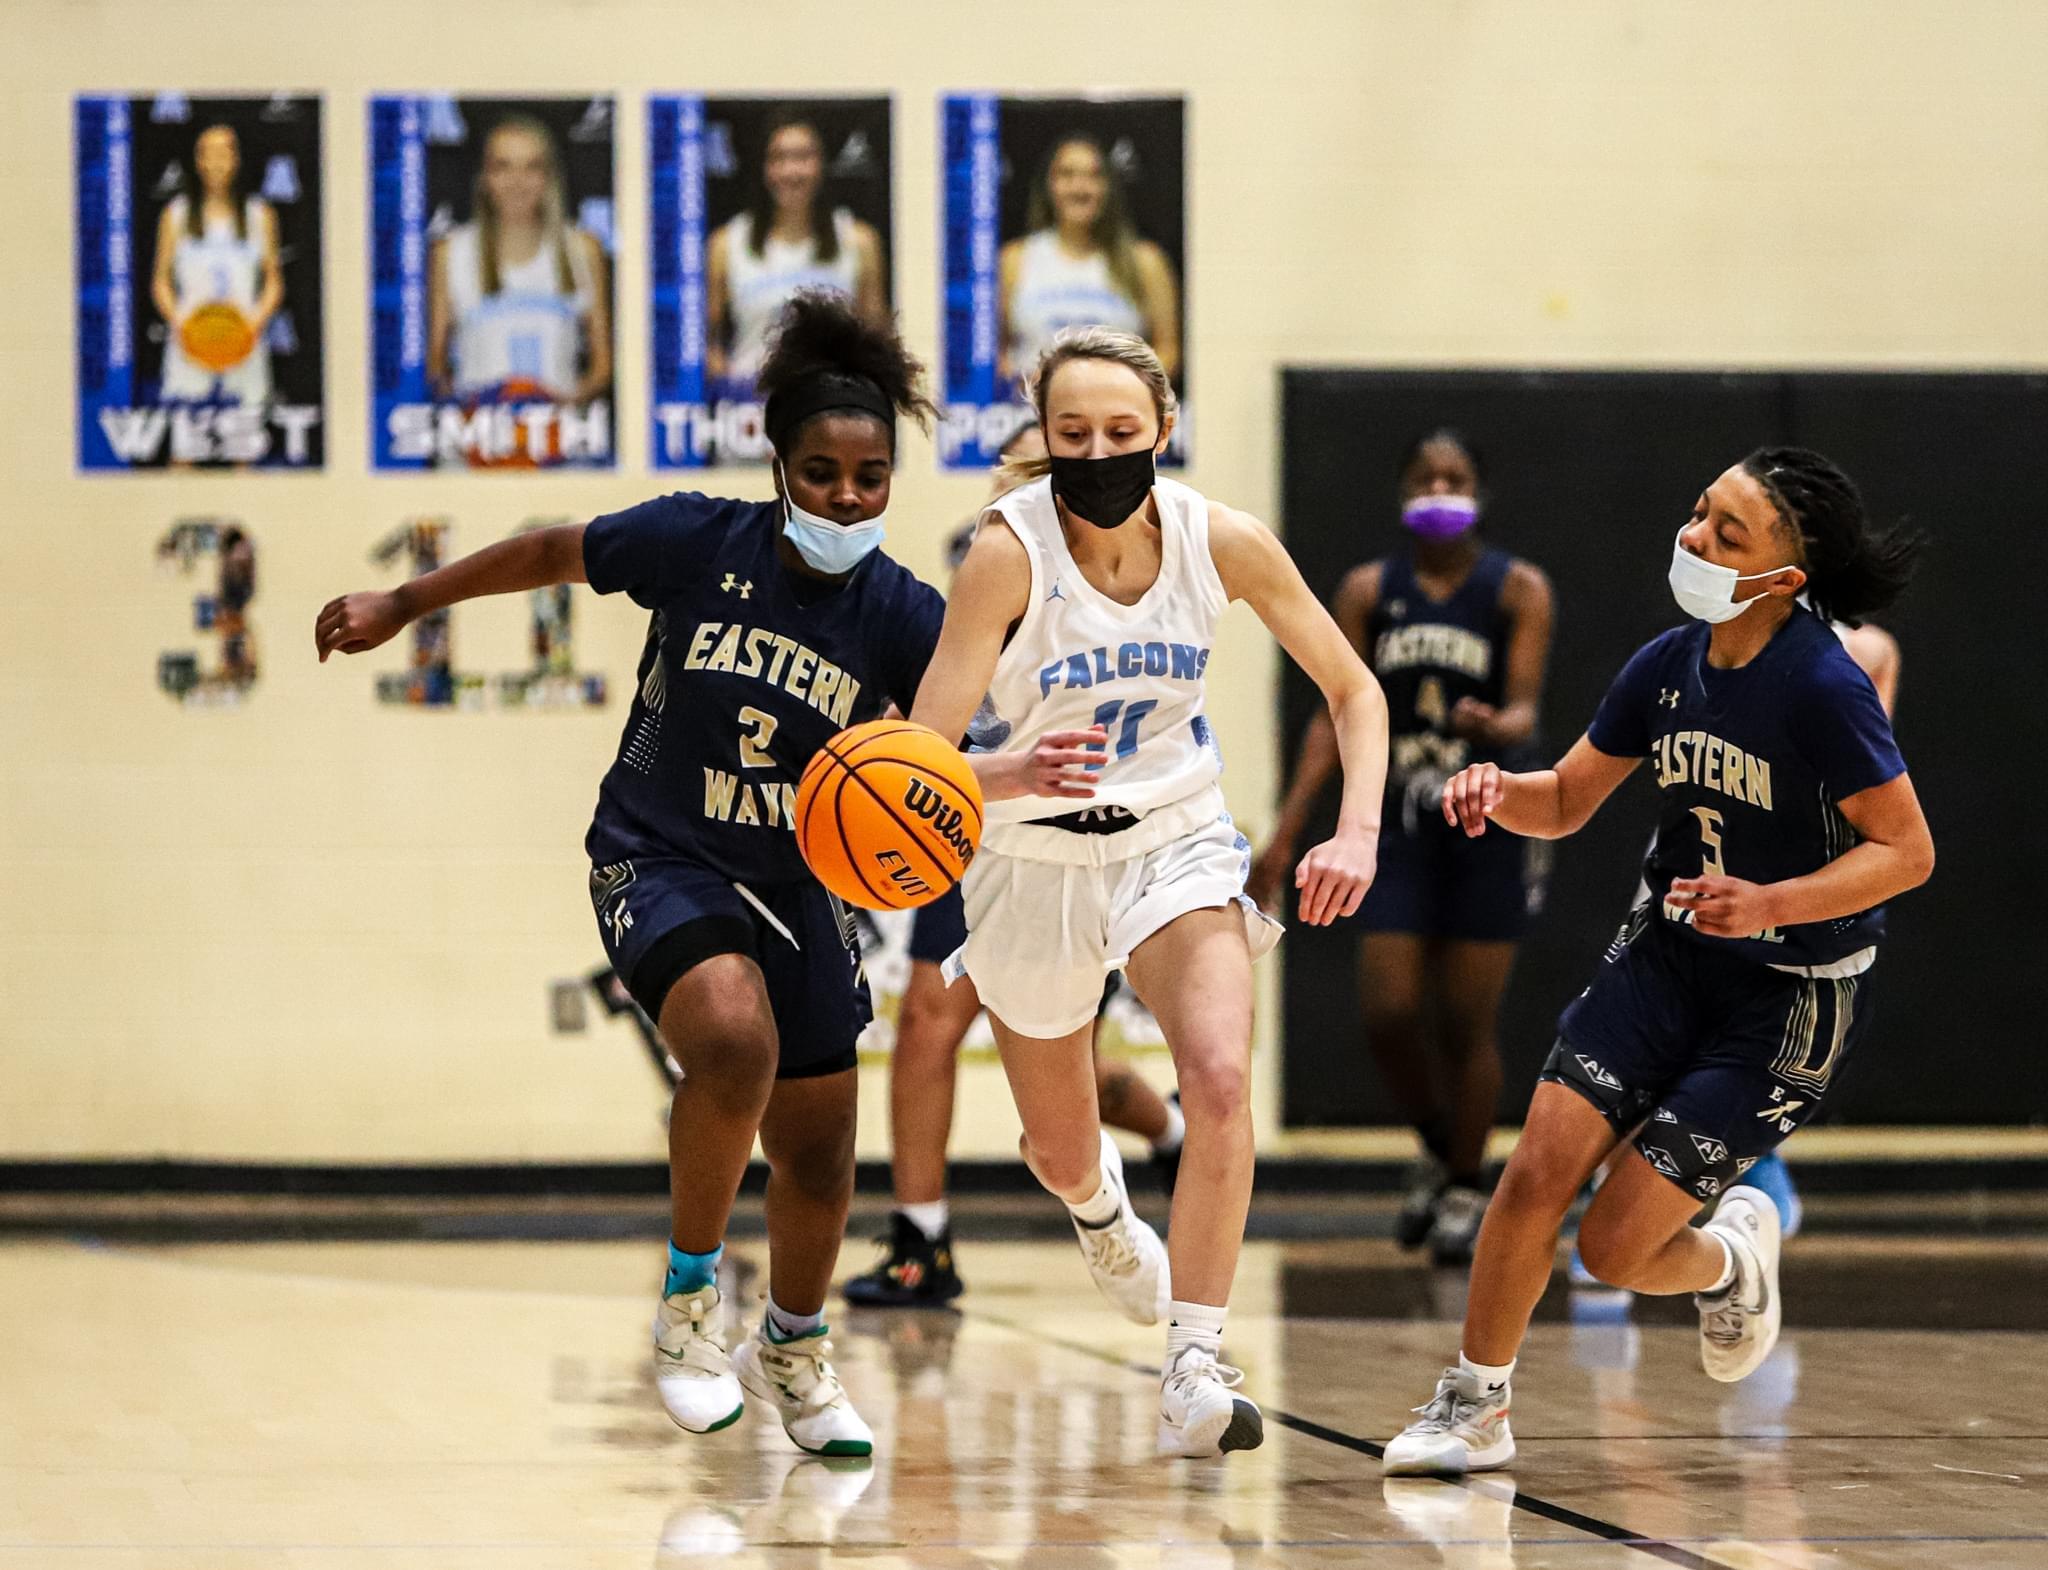 Girls Basketball: Golden Falcons Defeat Eastern Wayne On Senior Night (PHOTO GALLERY)